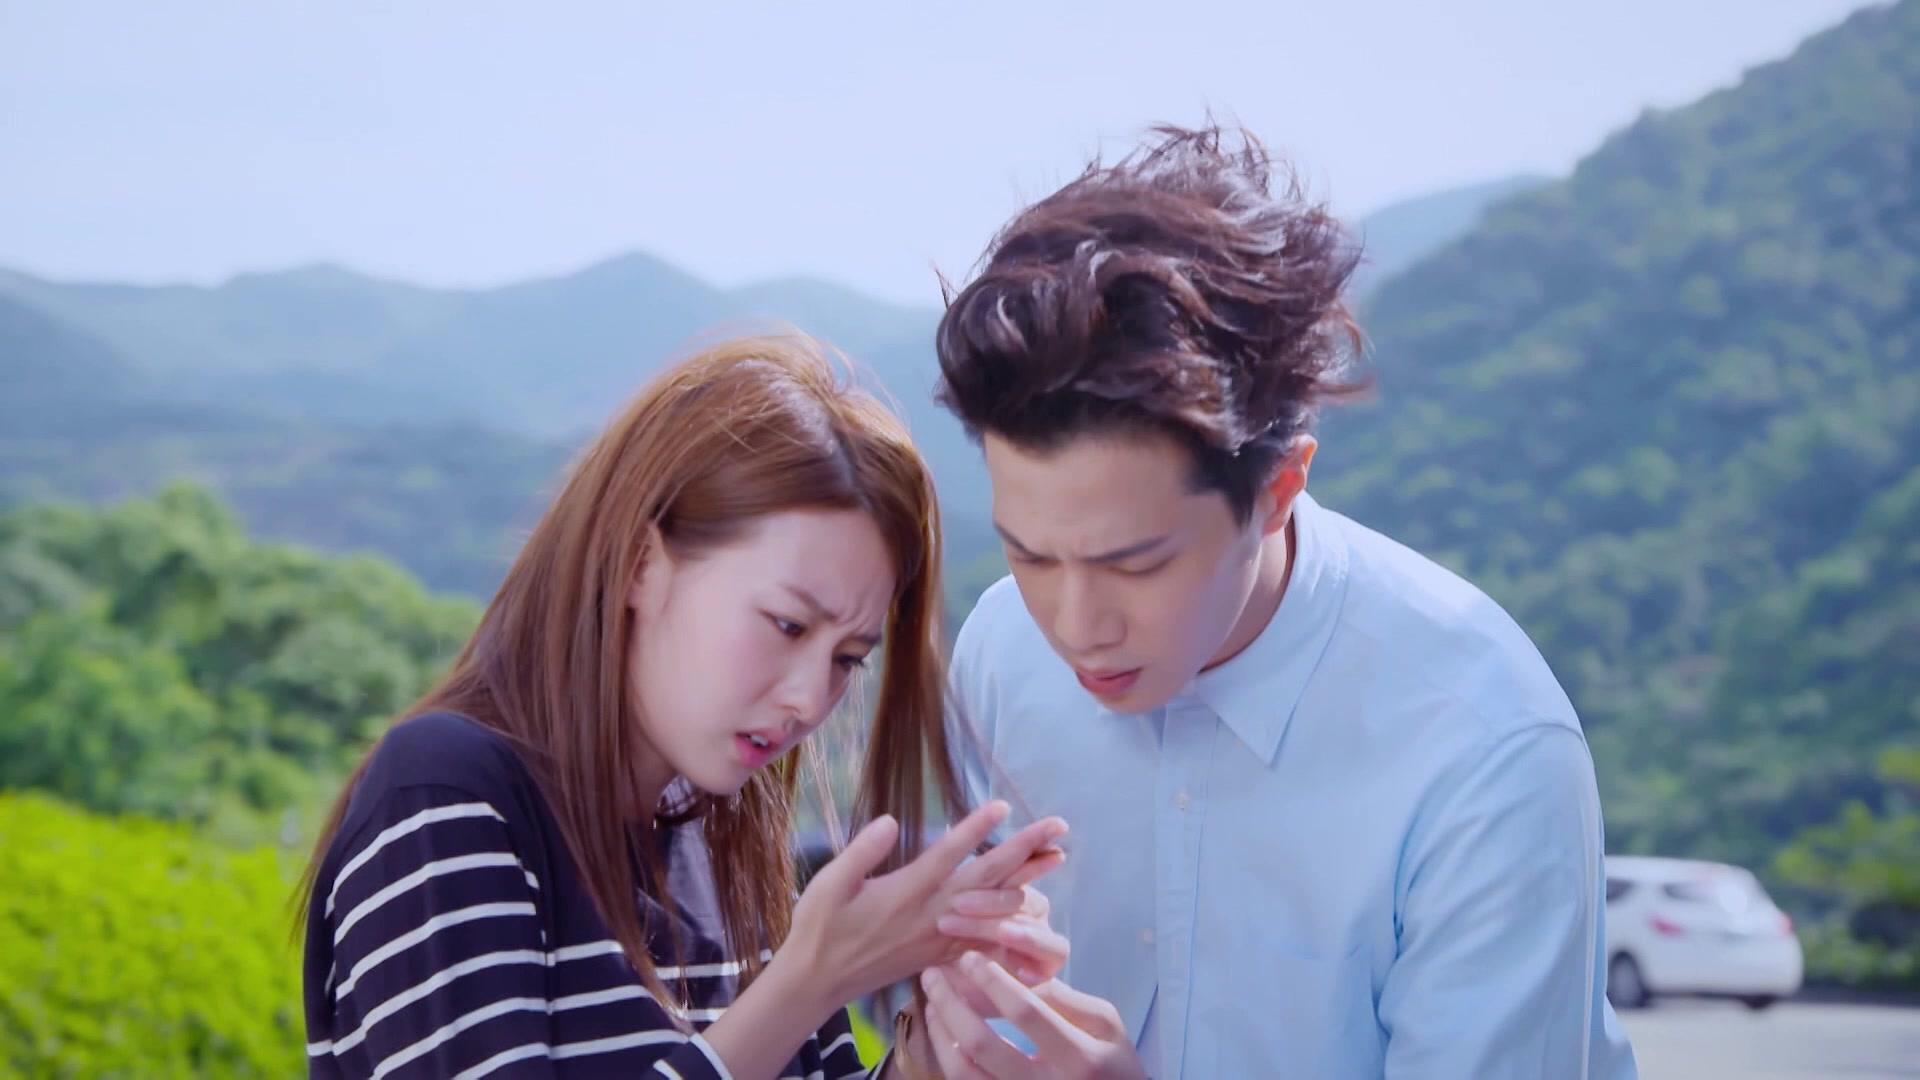 Floresta Do Mal Online intended for le prince loup - 狼王子 - regardez l'épisode en entier